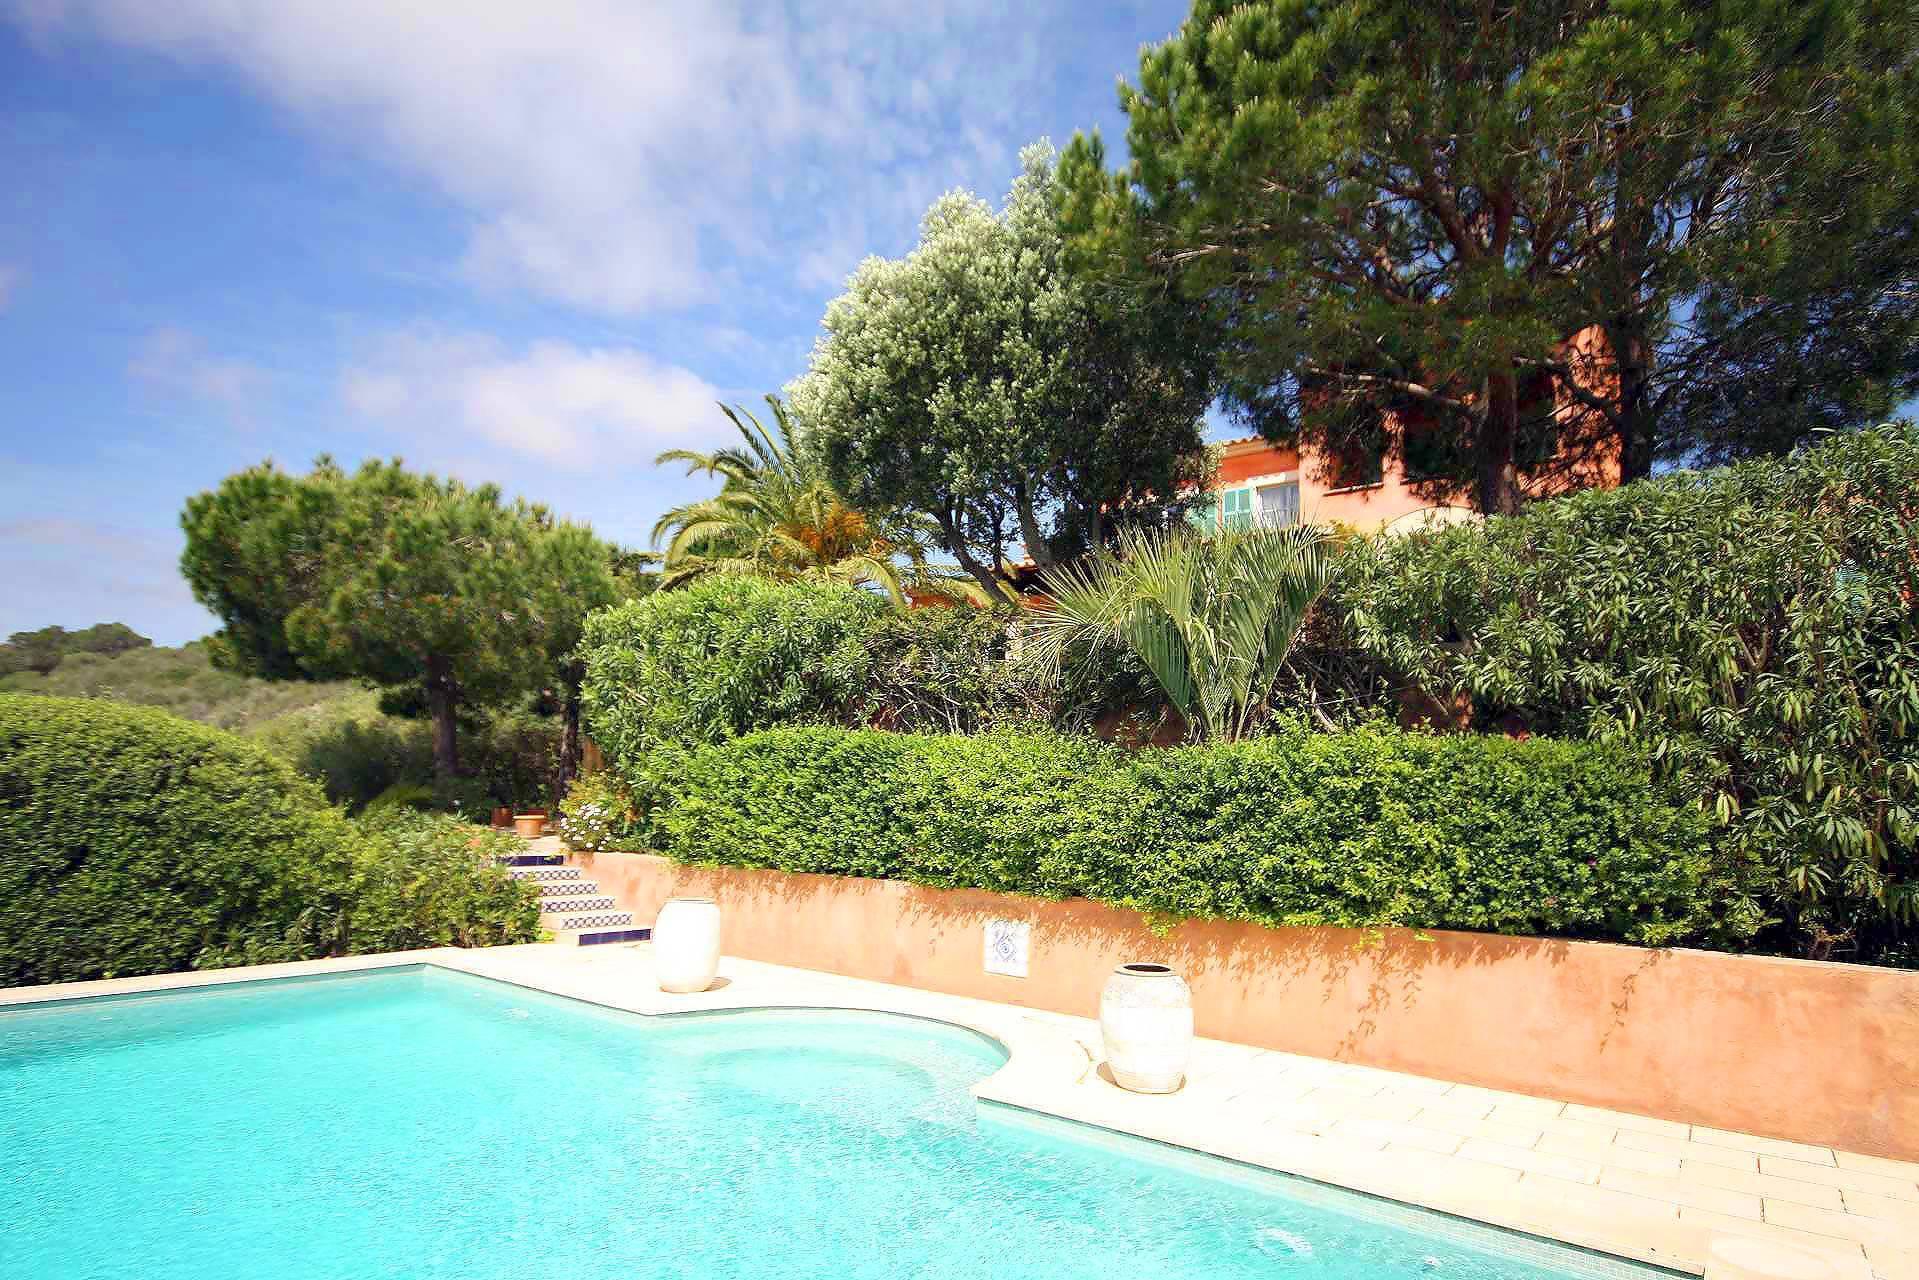 01-98 Extravagantes Ferienhaus Mallorca Osten Bild 5